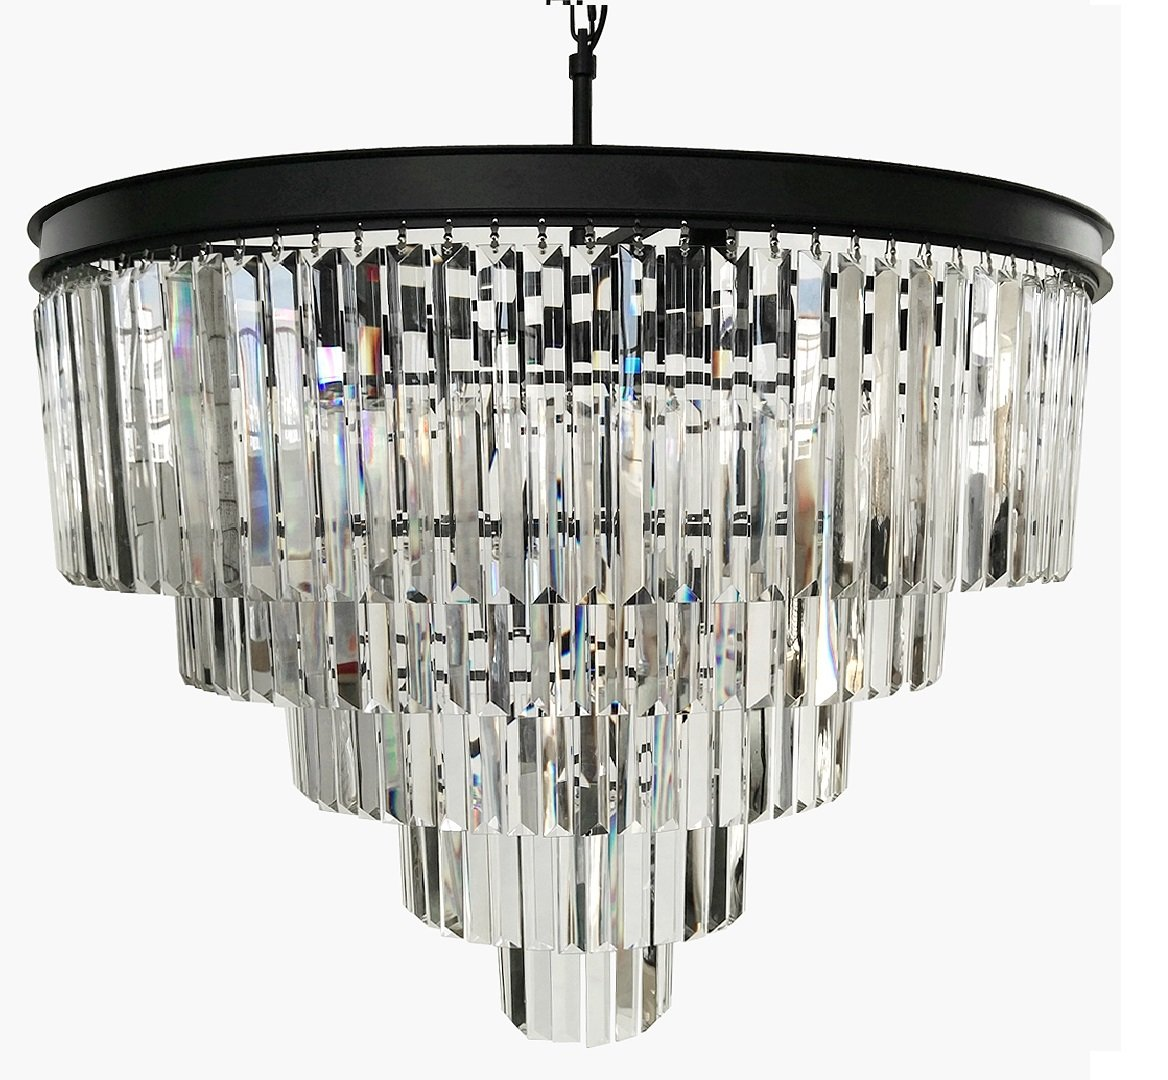 Lumos 12 Lights Luxury Modern Crystal Chandelier Pendant Ceiling Light for Dining Room, Living Room … (12 Lights)